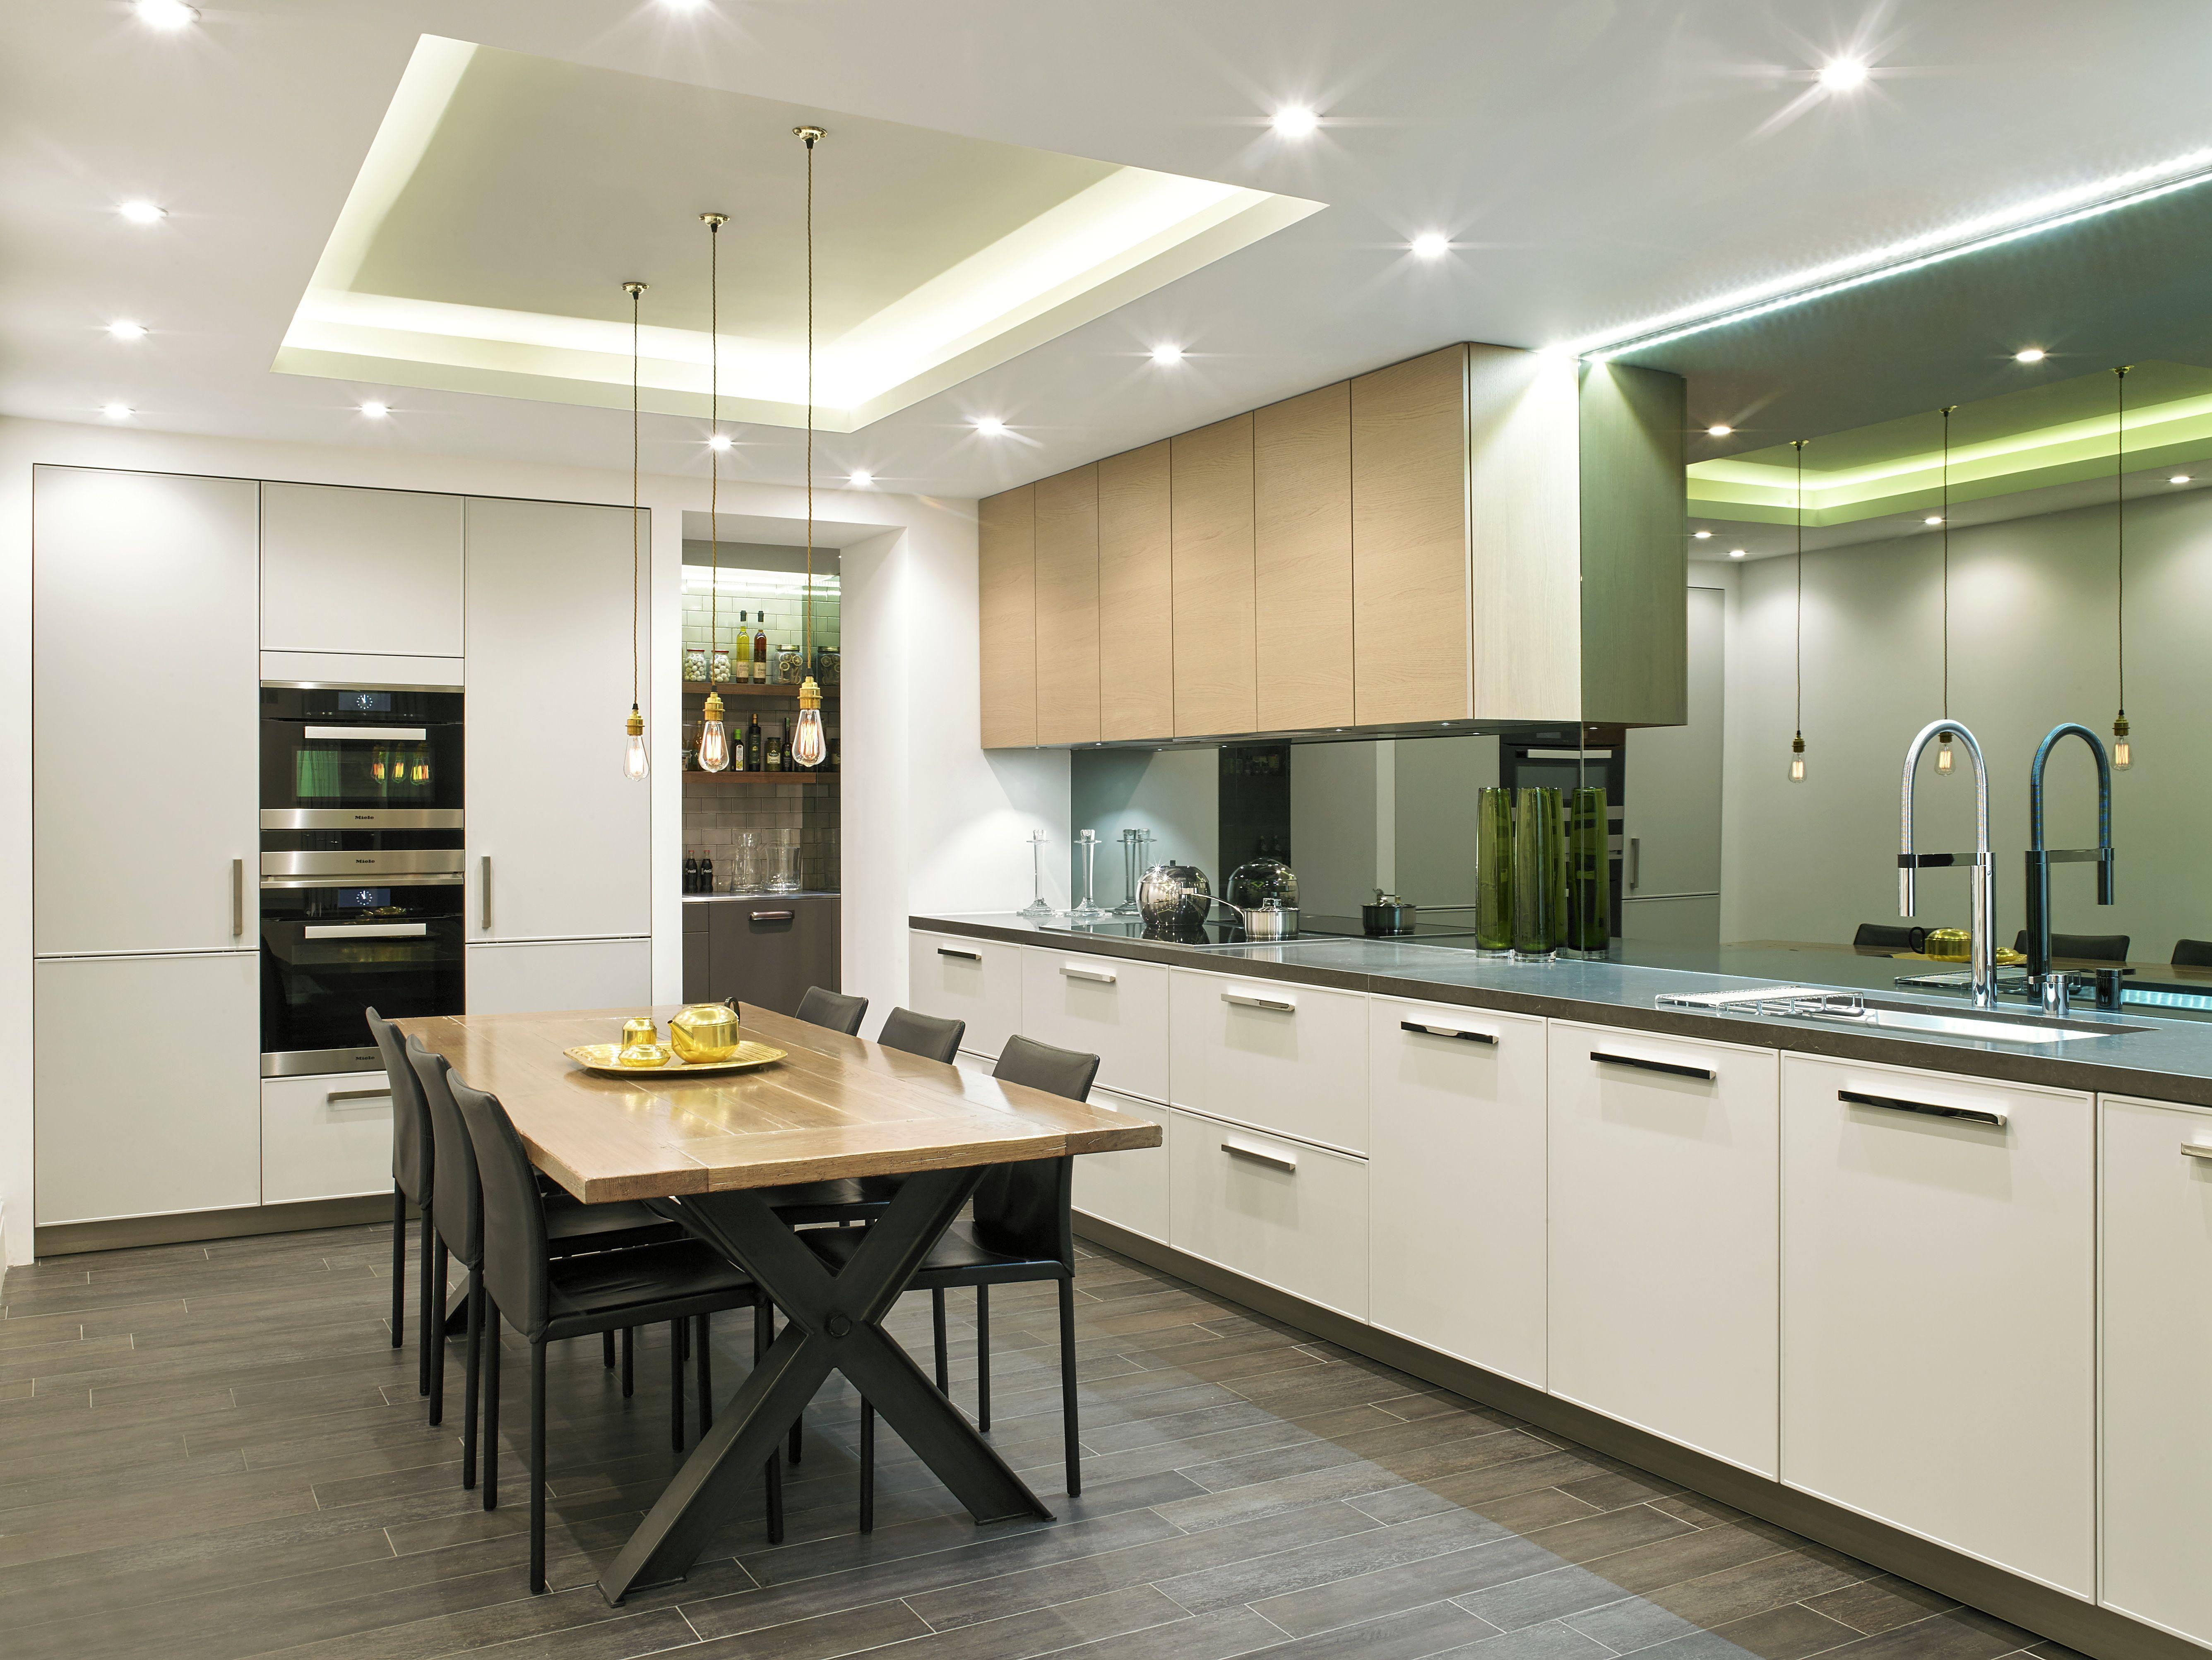 Ex Display Kitchens, Cheap Kitchens